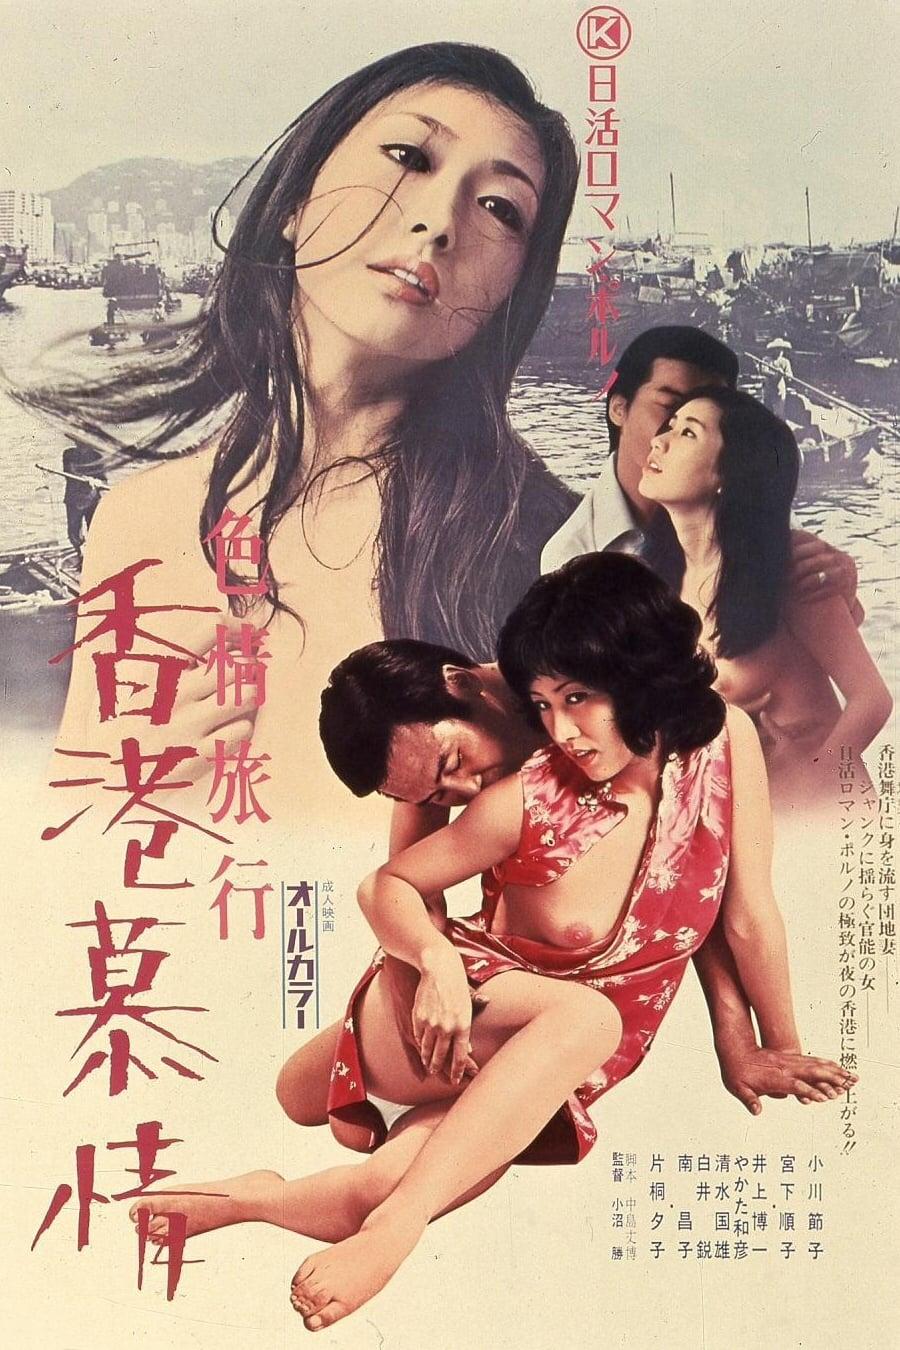 Erotic Journey: Love Affair in Hong Kong